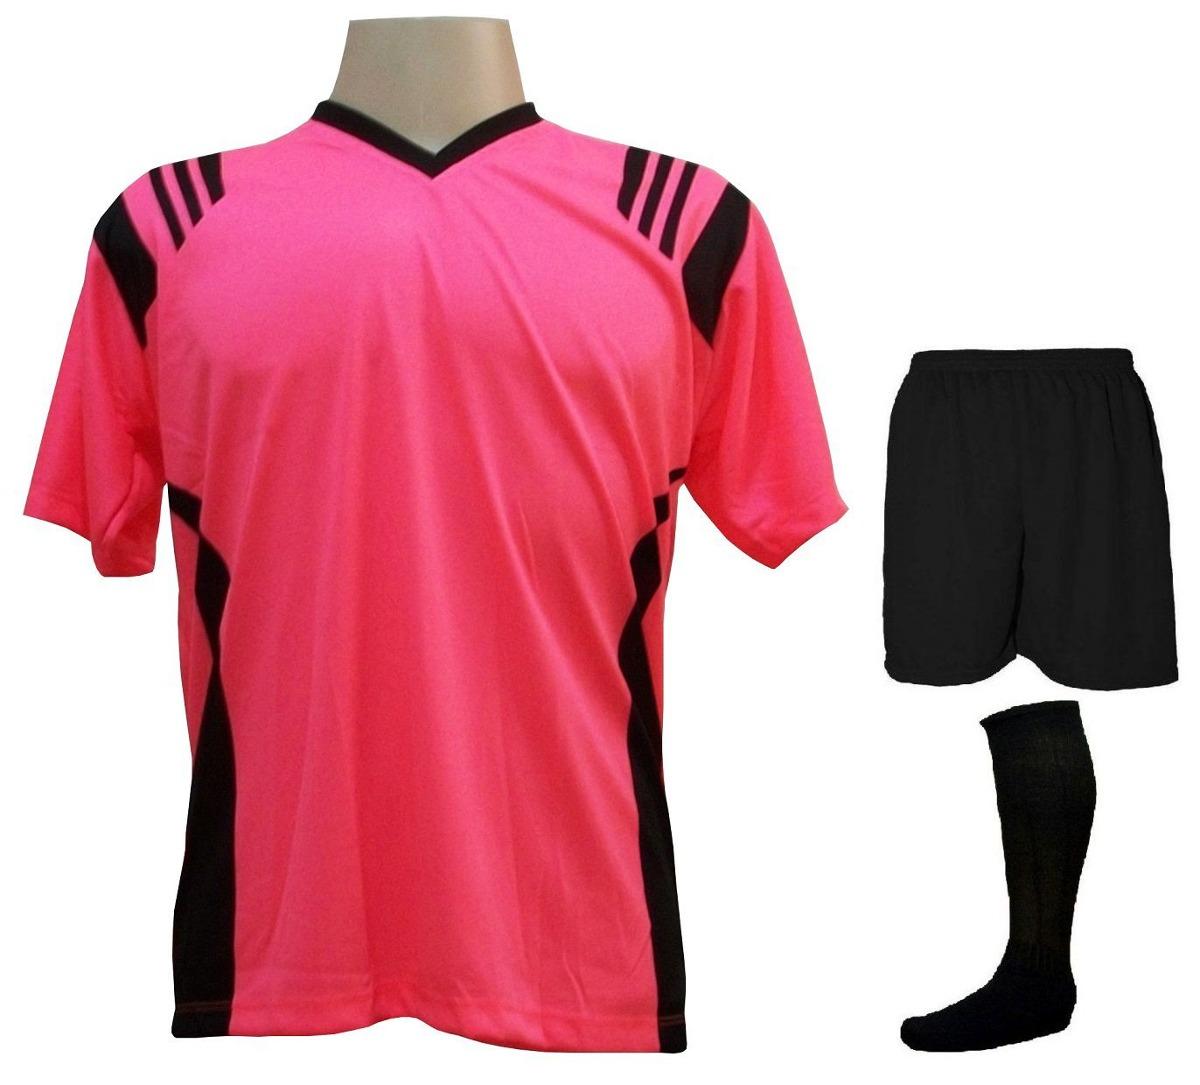 3ce3ac5cd08e2 uniforme completo modelo roma rosa preto 18+2 + brindes. Carregando zoom.